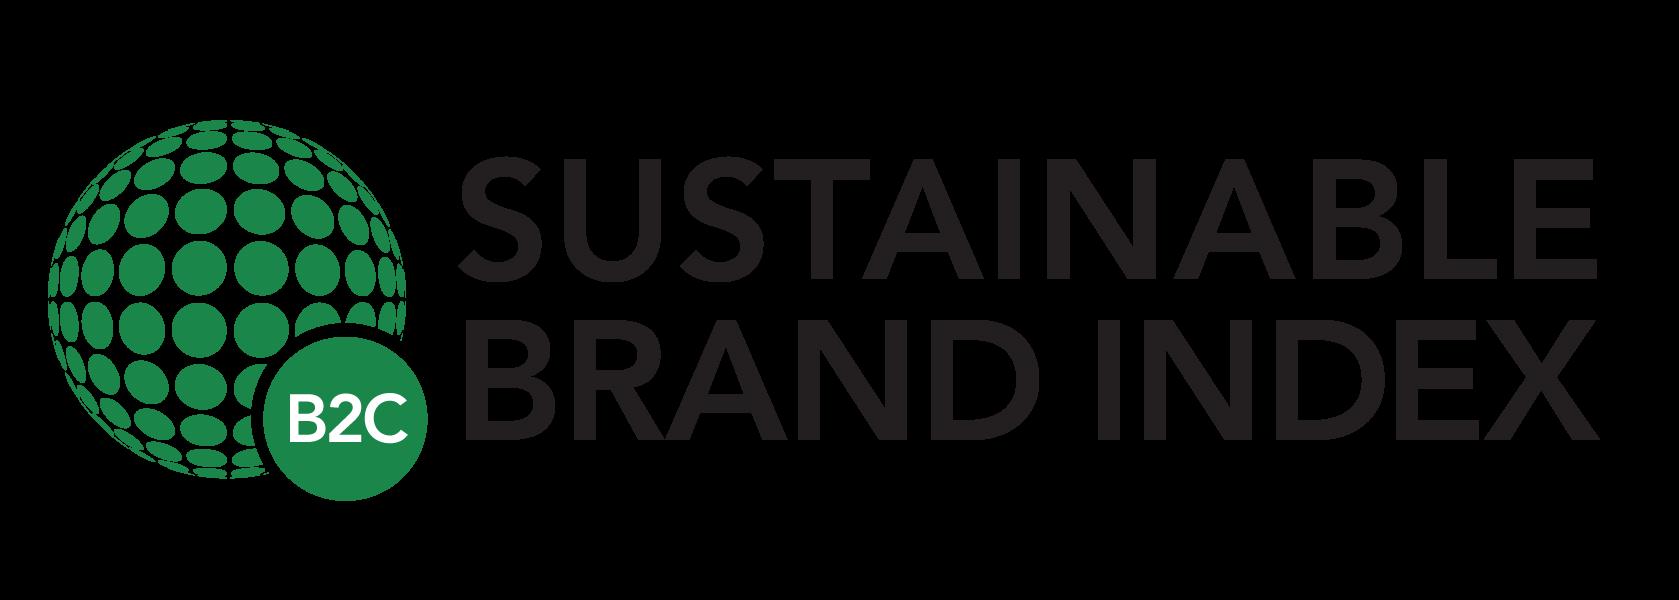 SB_Index_Logo_B2C.png